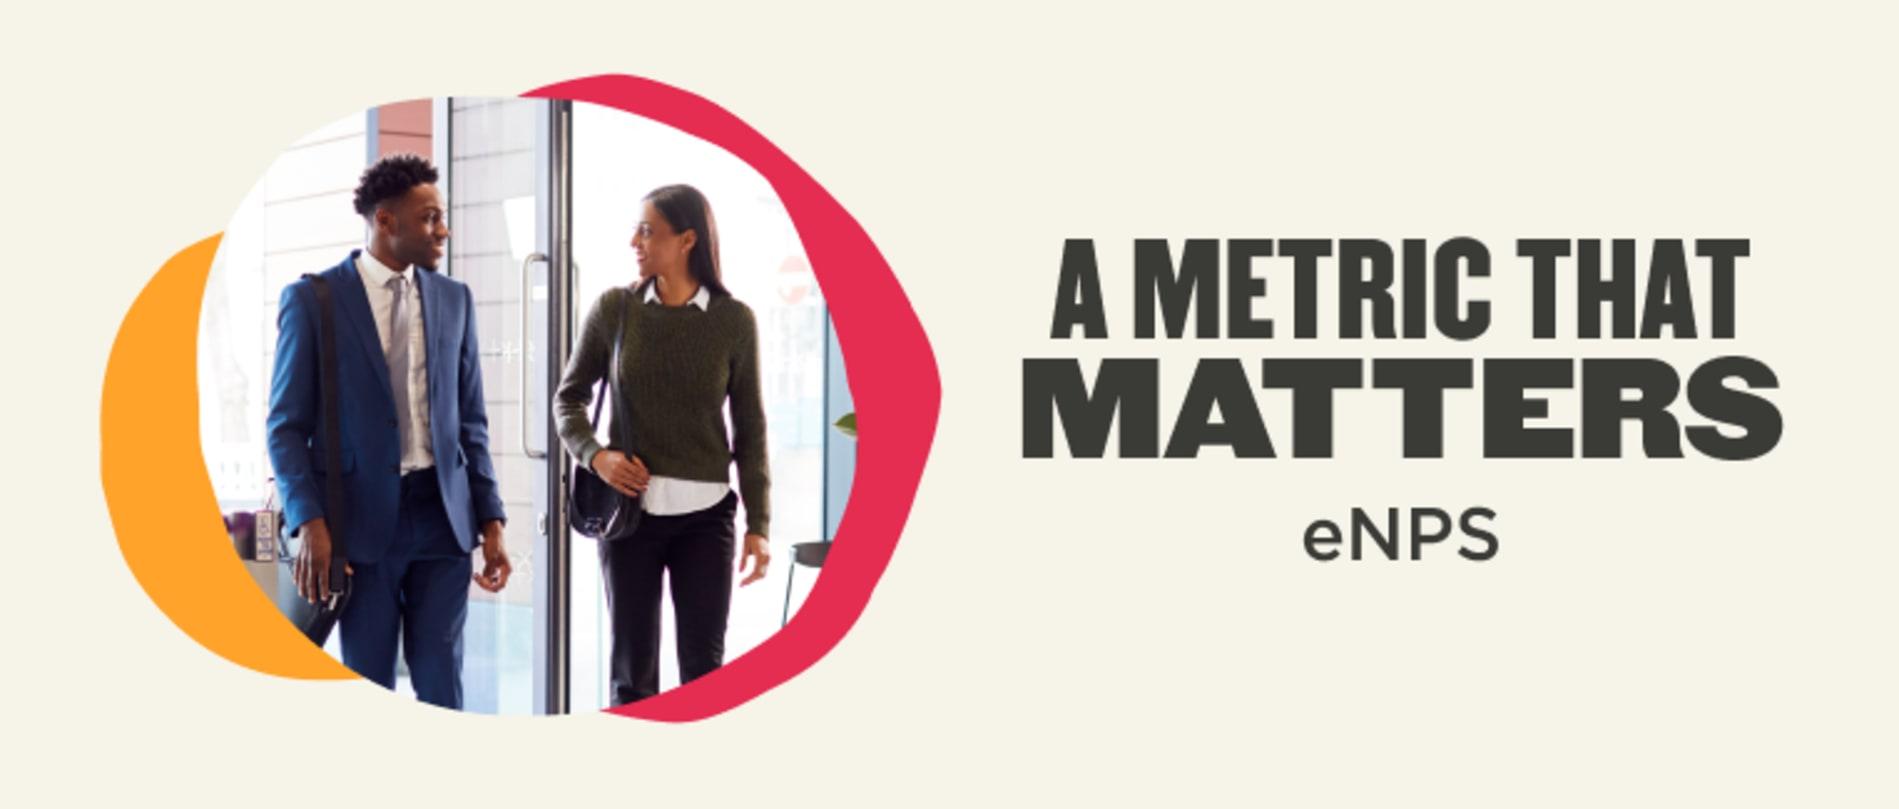 A metric that matters (eNPS)